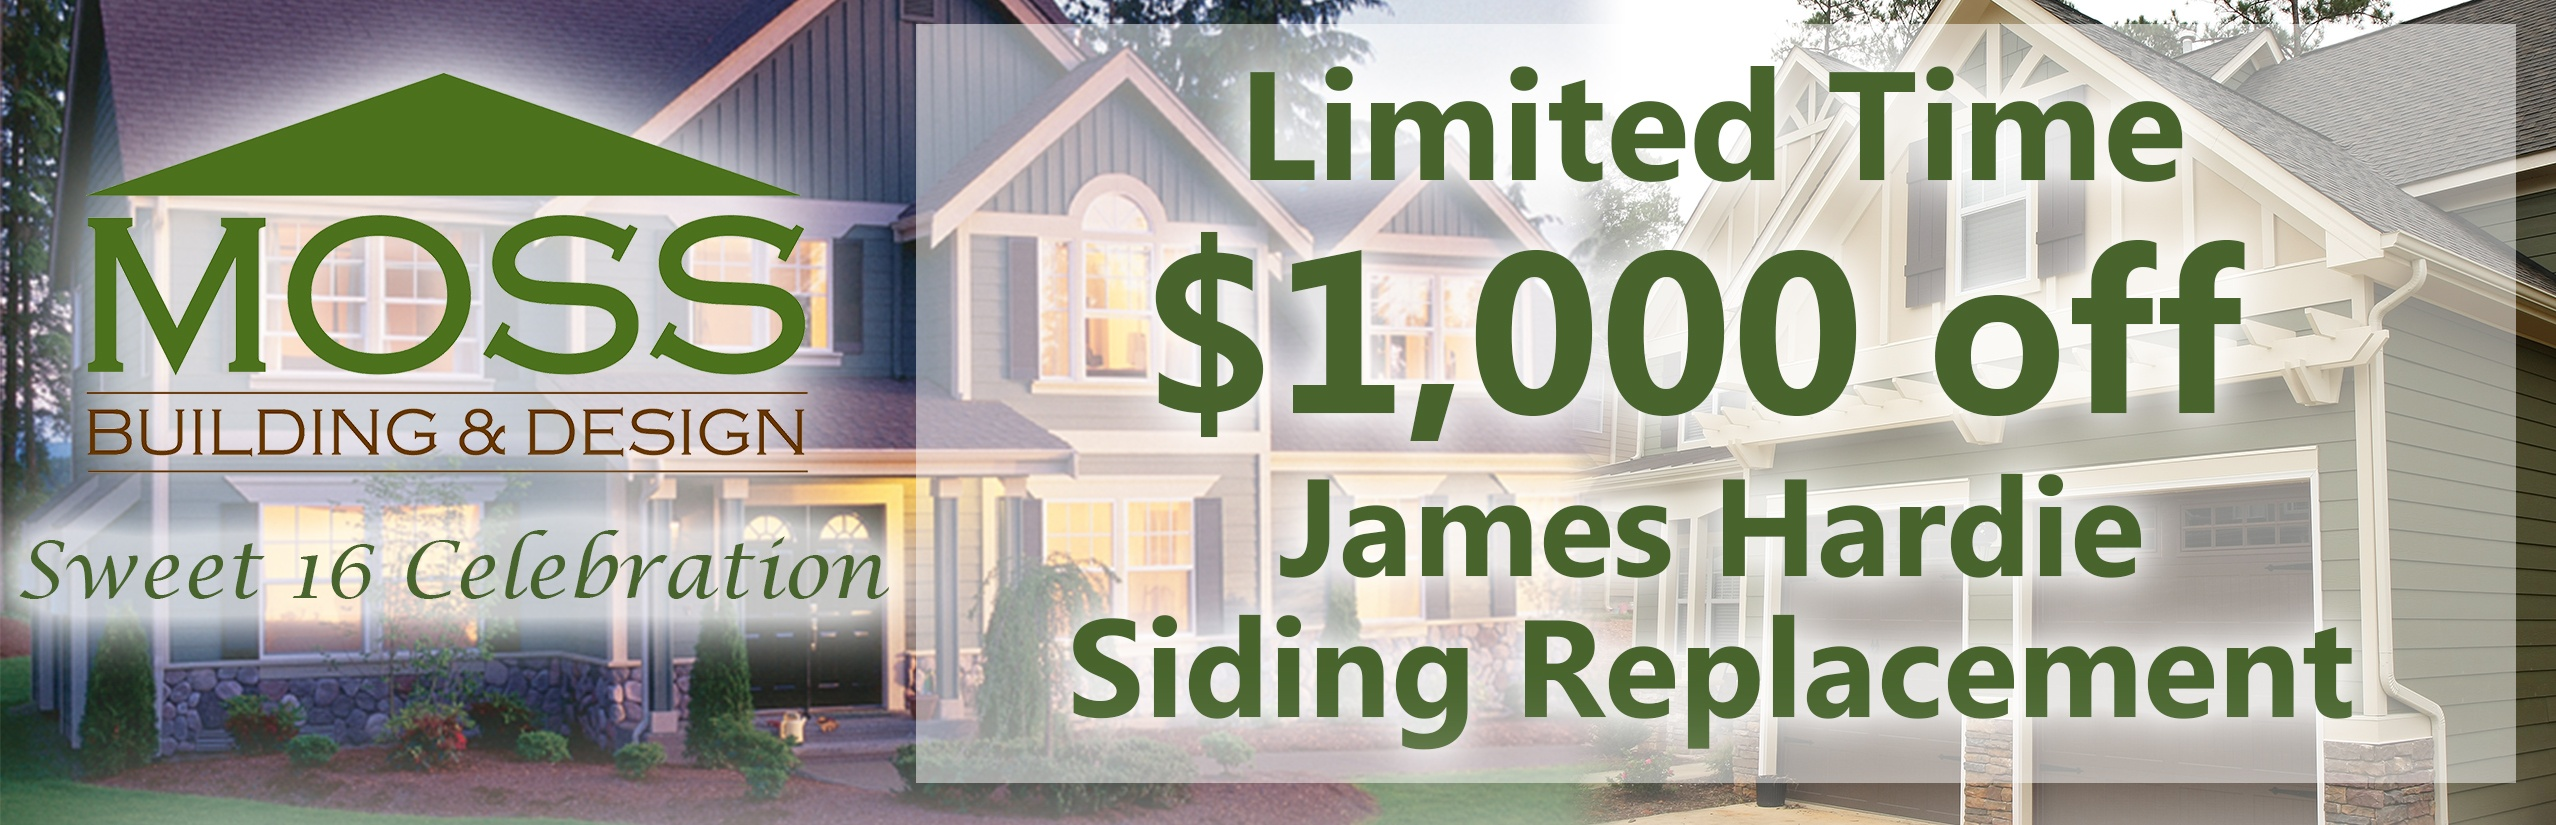 Money off James Hardie Siding